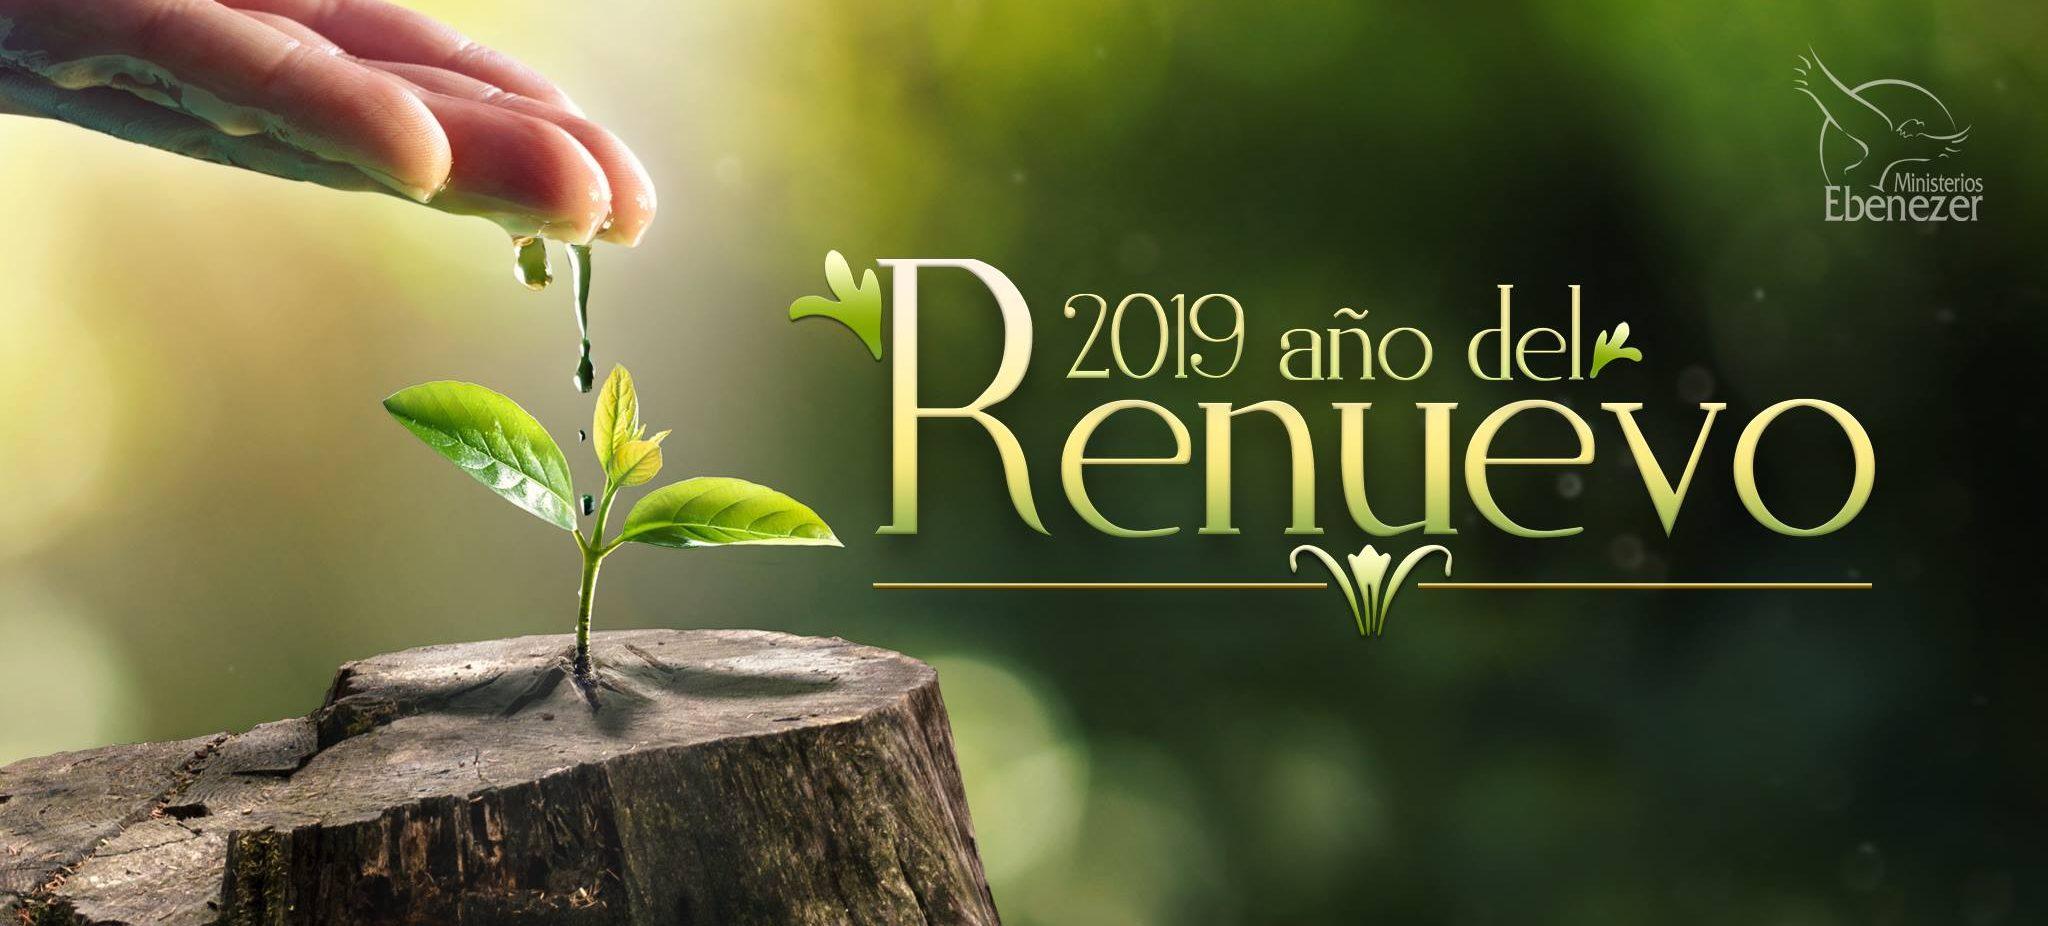 Año del Renuevo